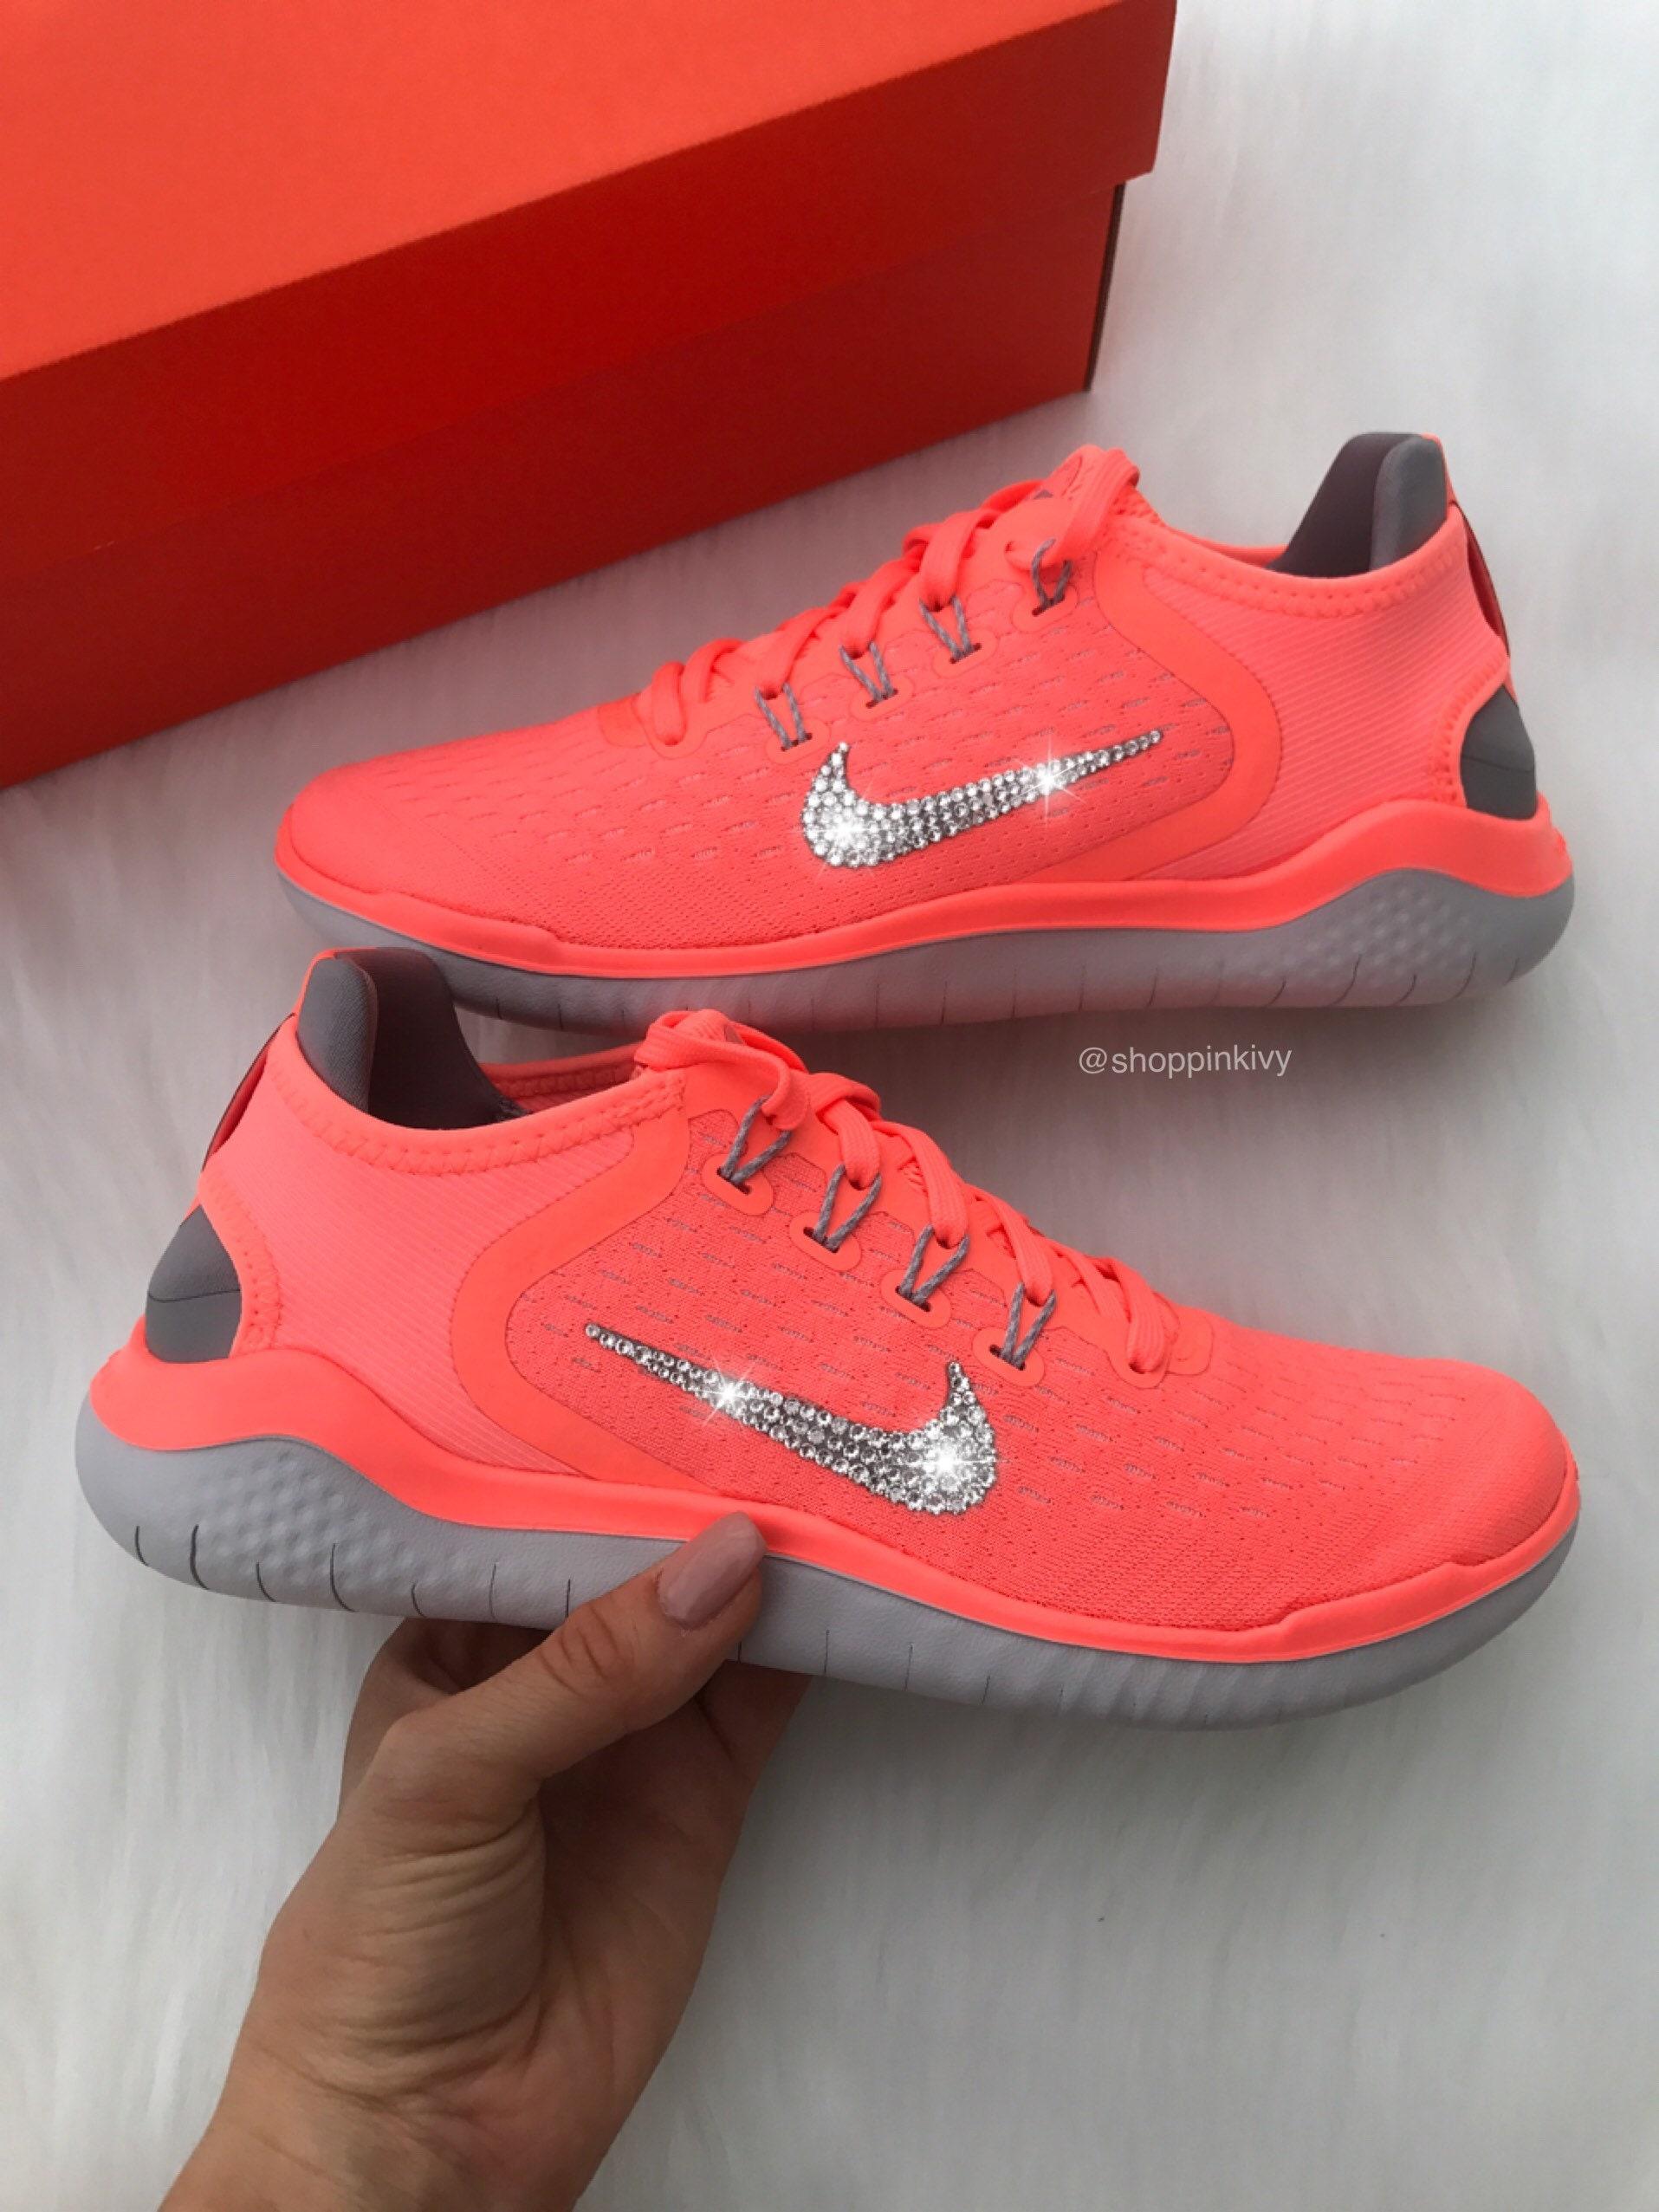 Swarovski Nike Free Rn Shoes With Swarovski Crystals Bling  6e355b9125dc